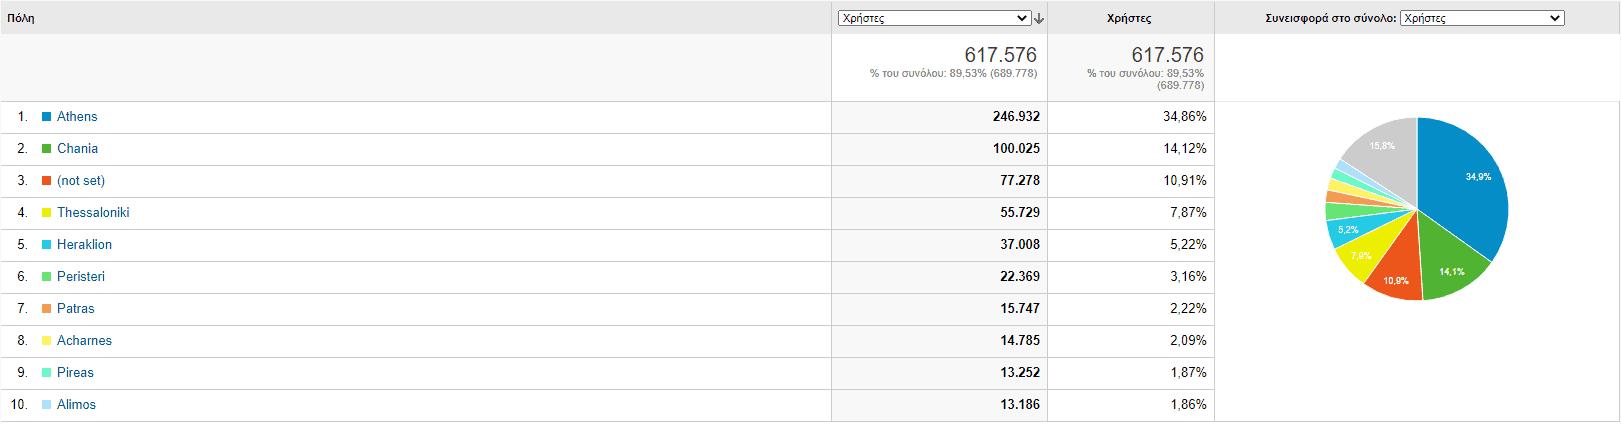 total users greek may 2021